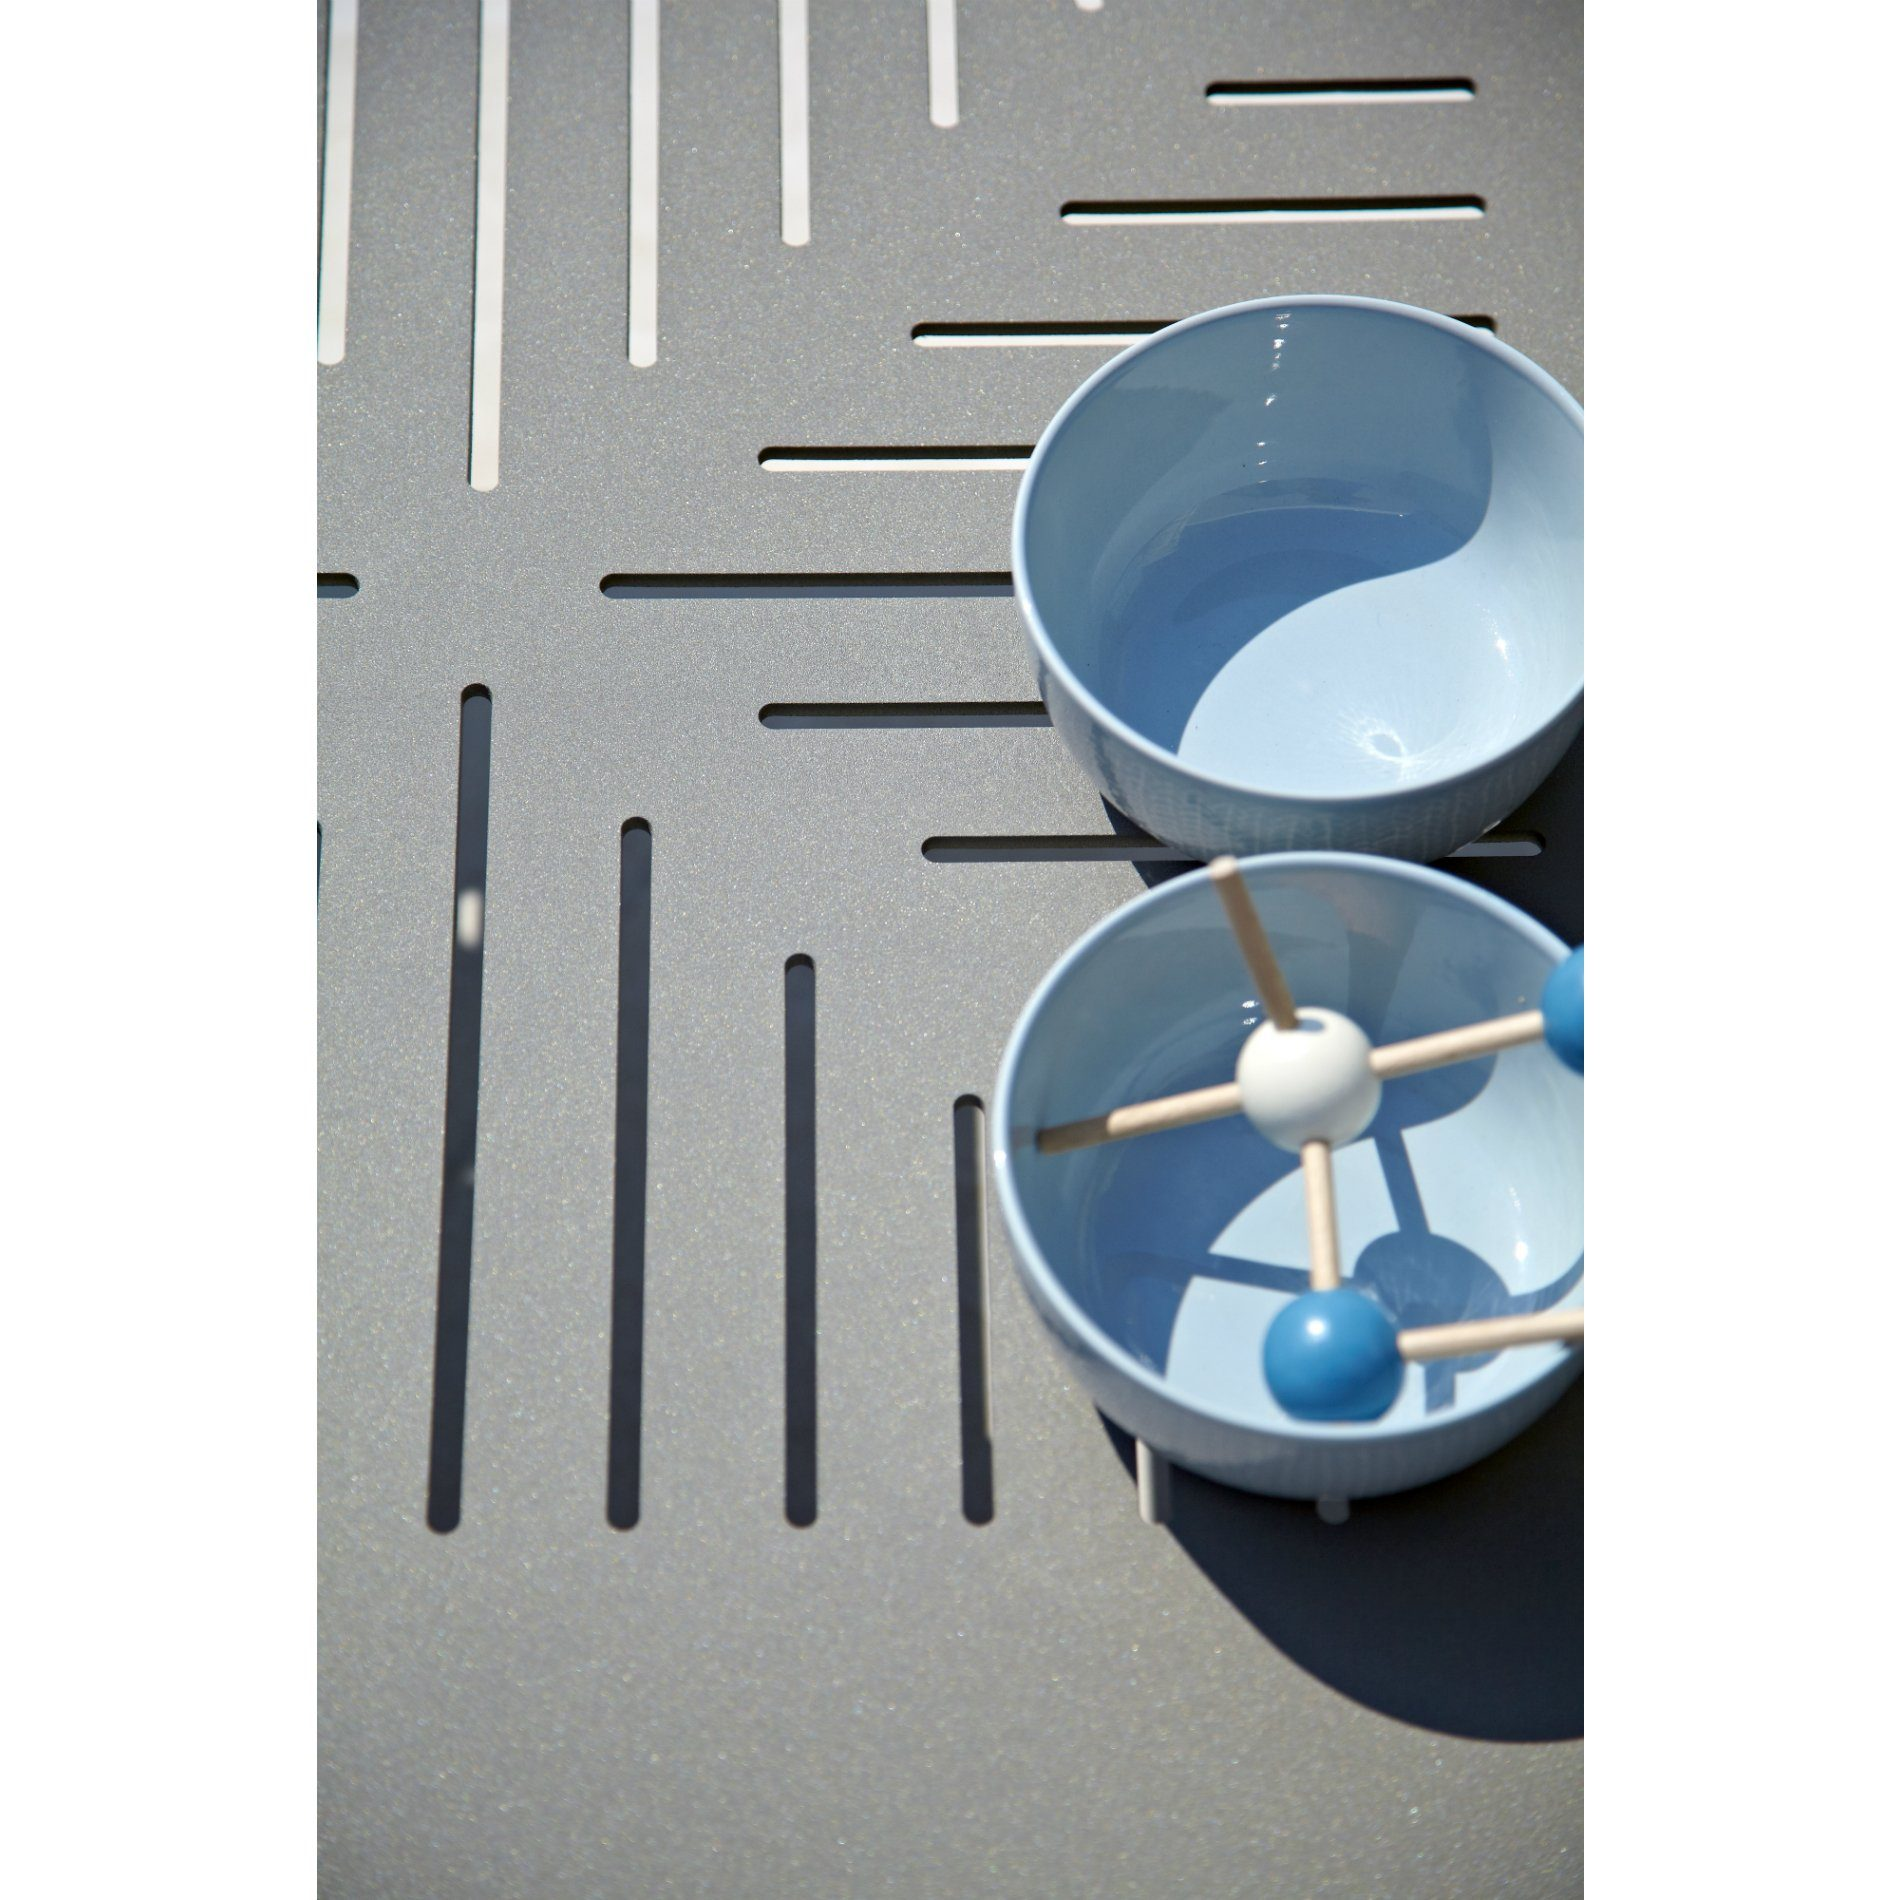 cane line conic loungetisch. Black Bedroom Furniture Sets. Home Design Ideas